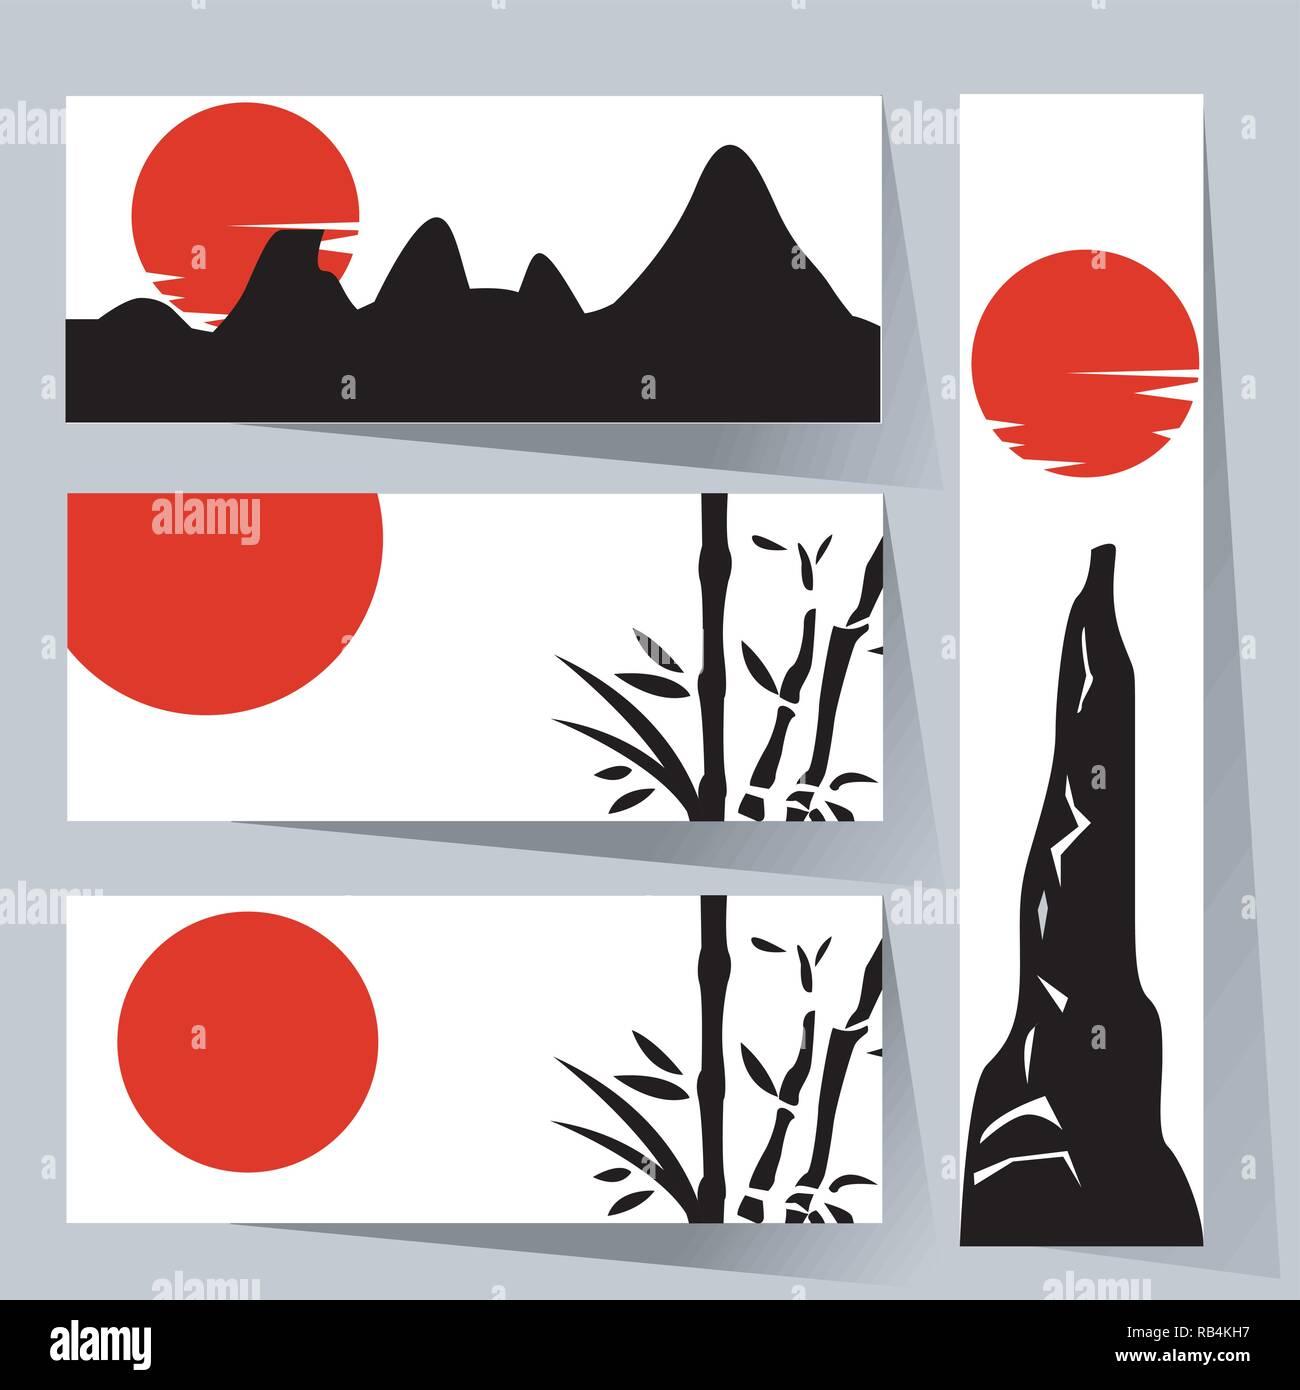 Traditionelle Japanische Malerei Stock Vektorgrafik Alamy